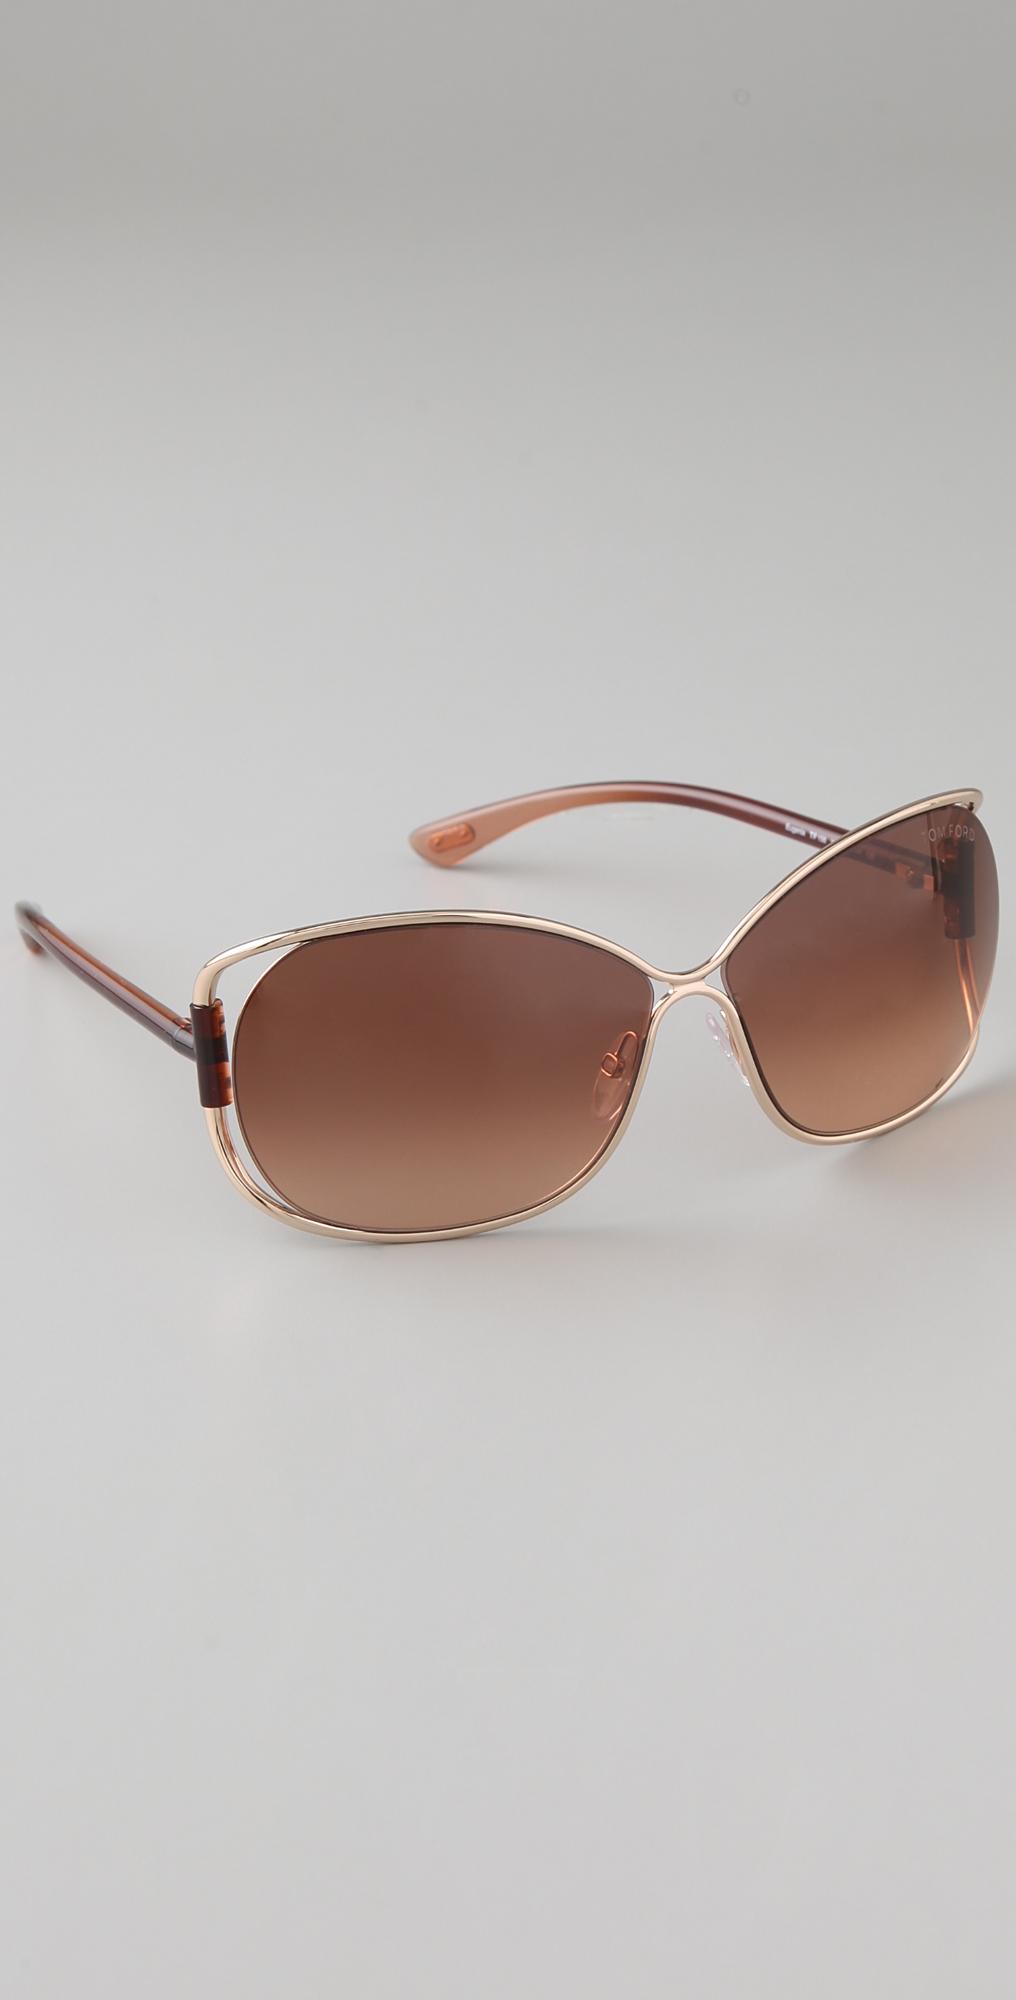 Tom Ford Eyewear Eugenia Sunglasses | SHOPBOP